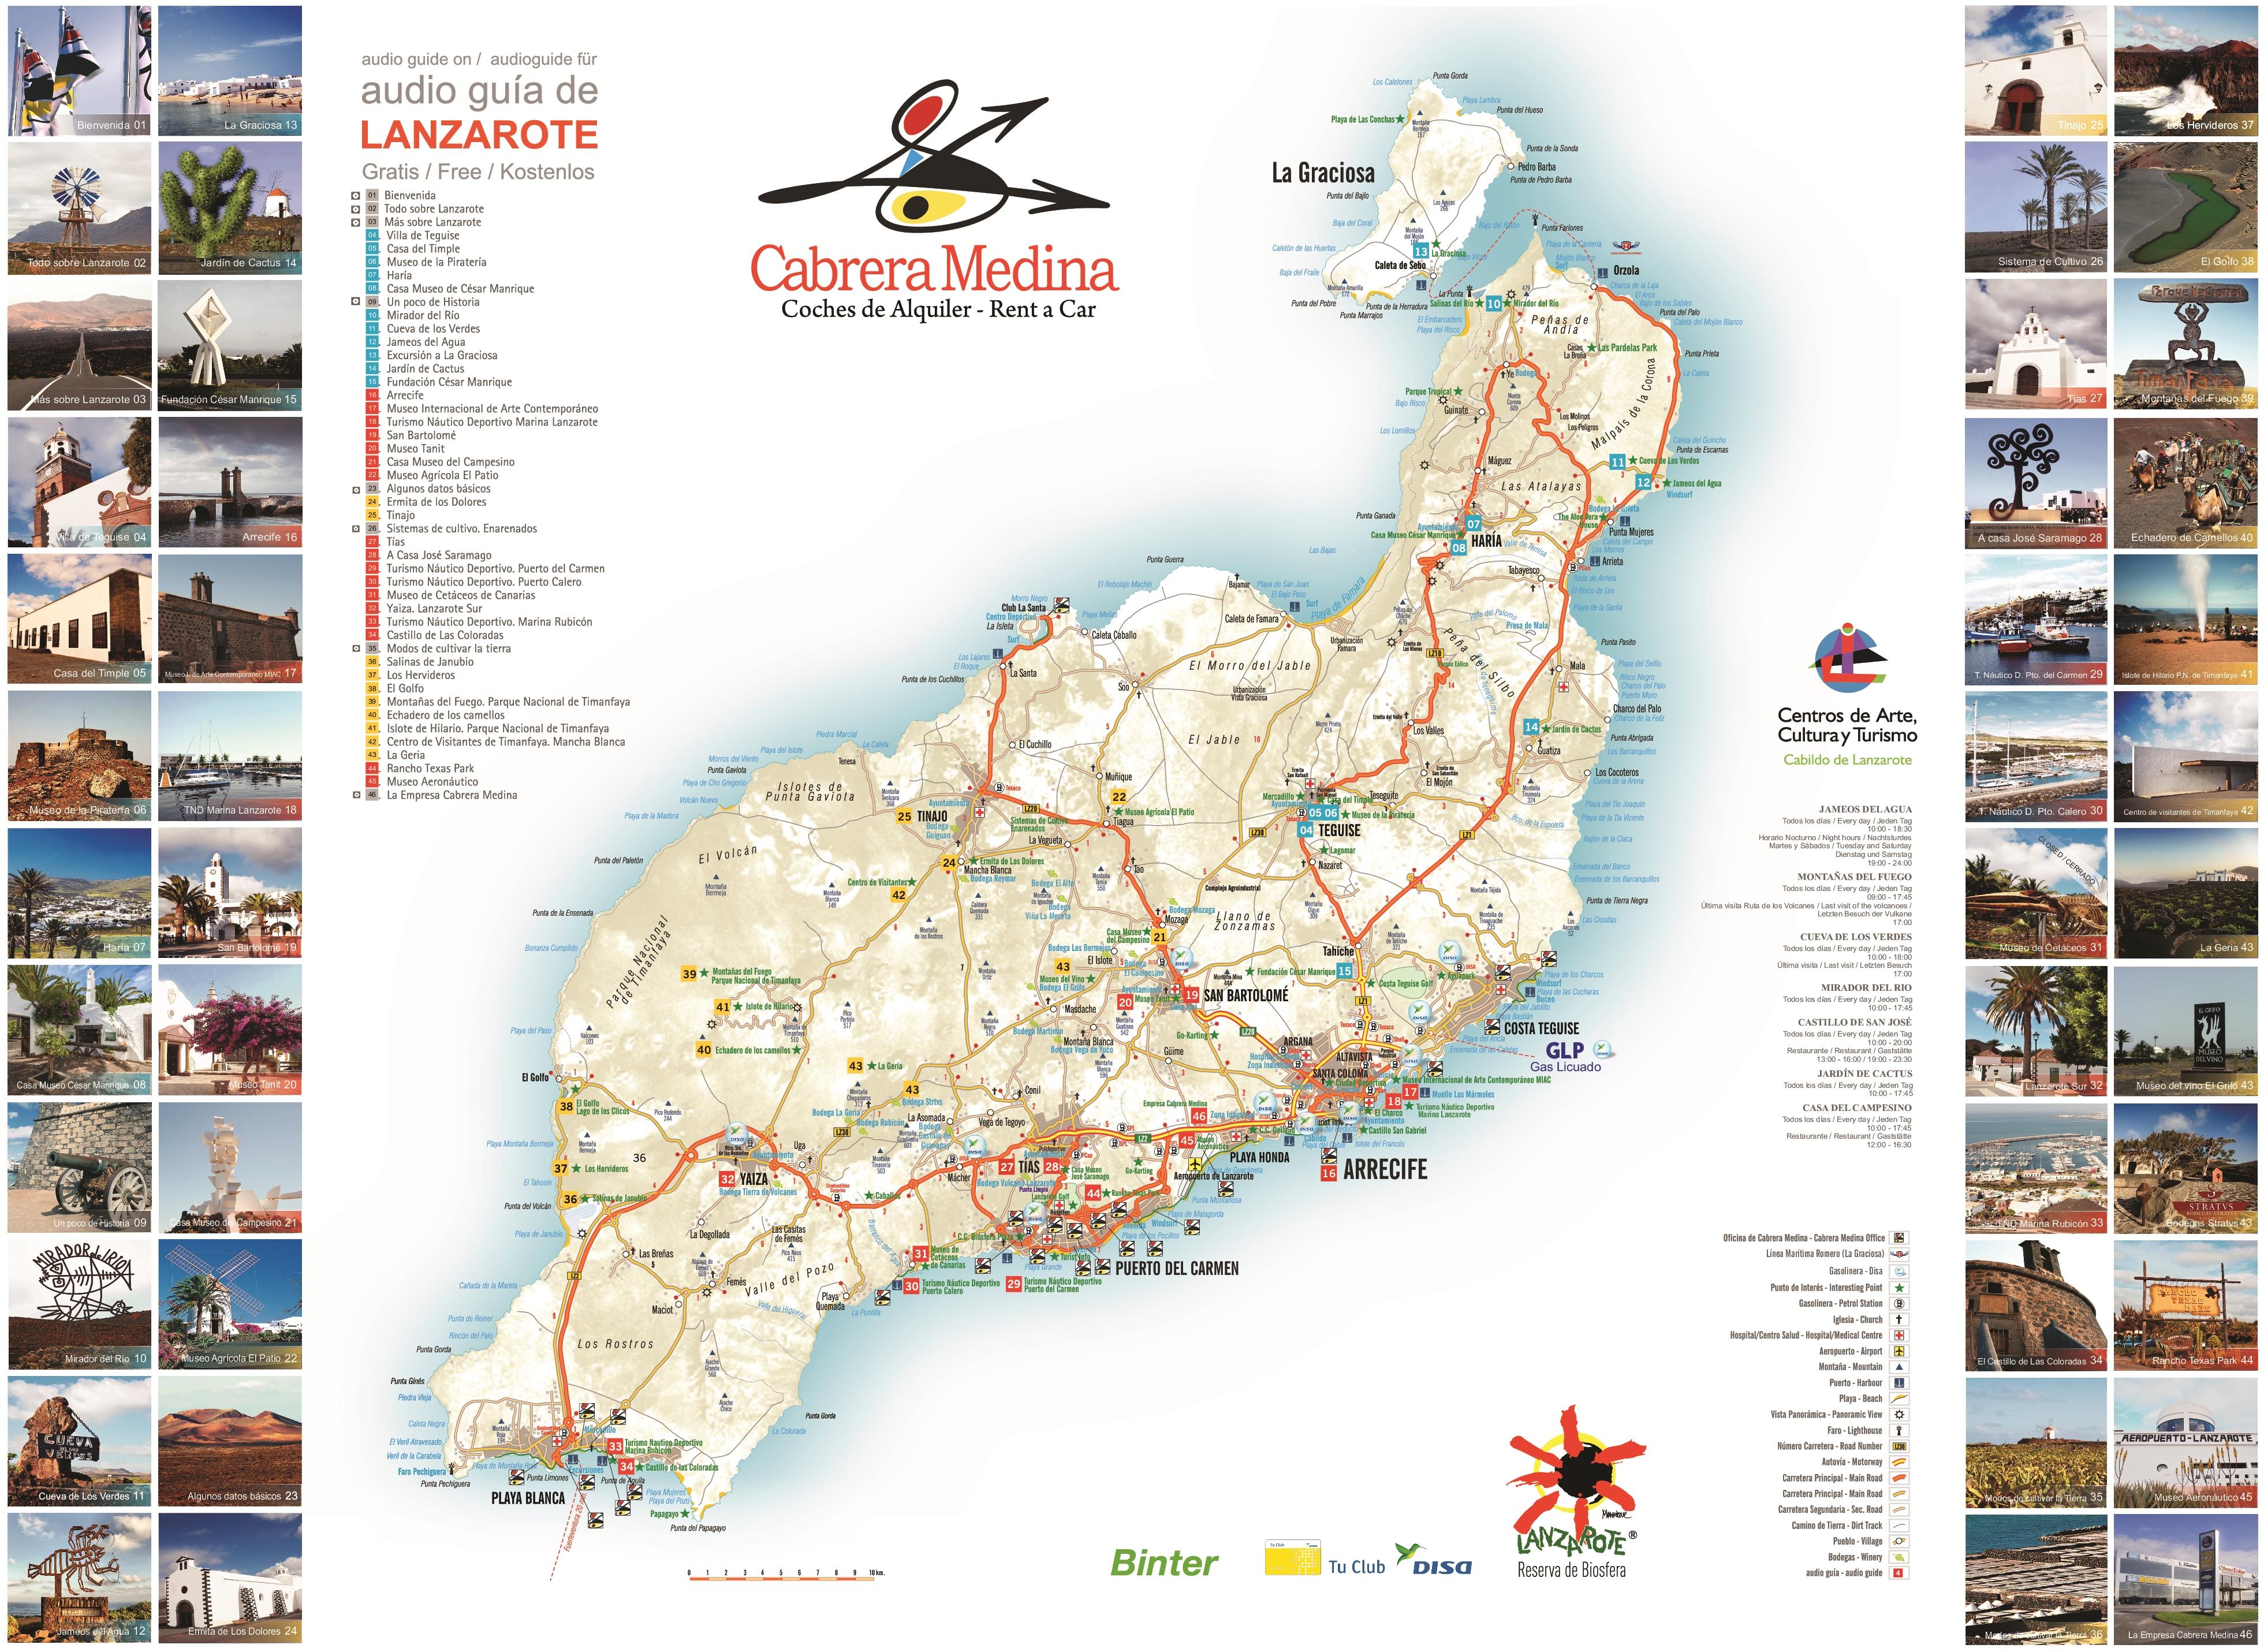 Map Of Lanzarote Lanzarote tourist map Map Of Lanzarote